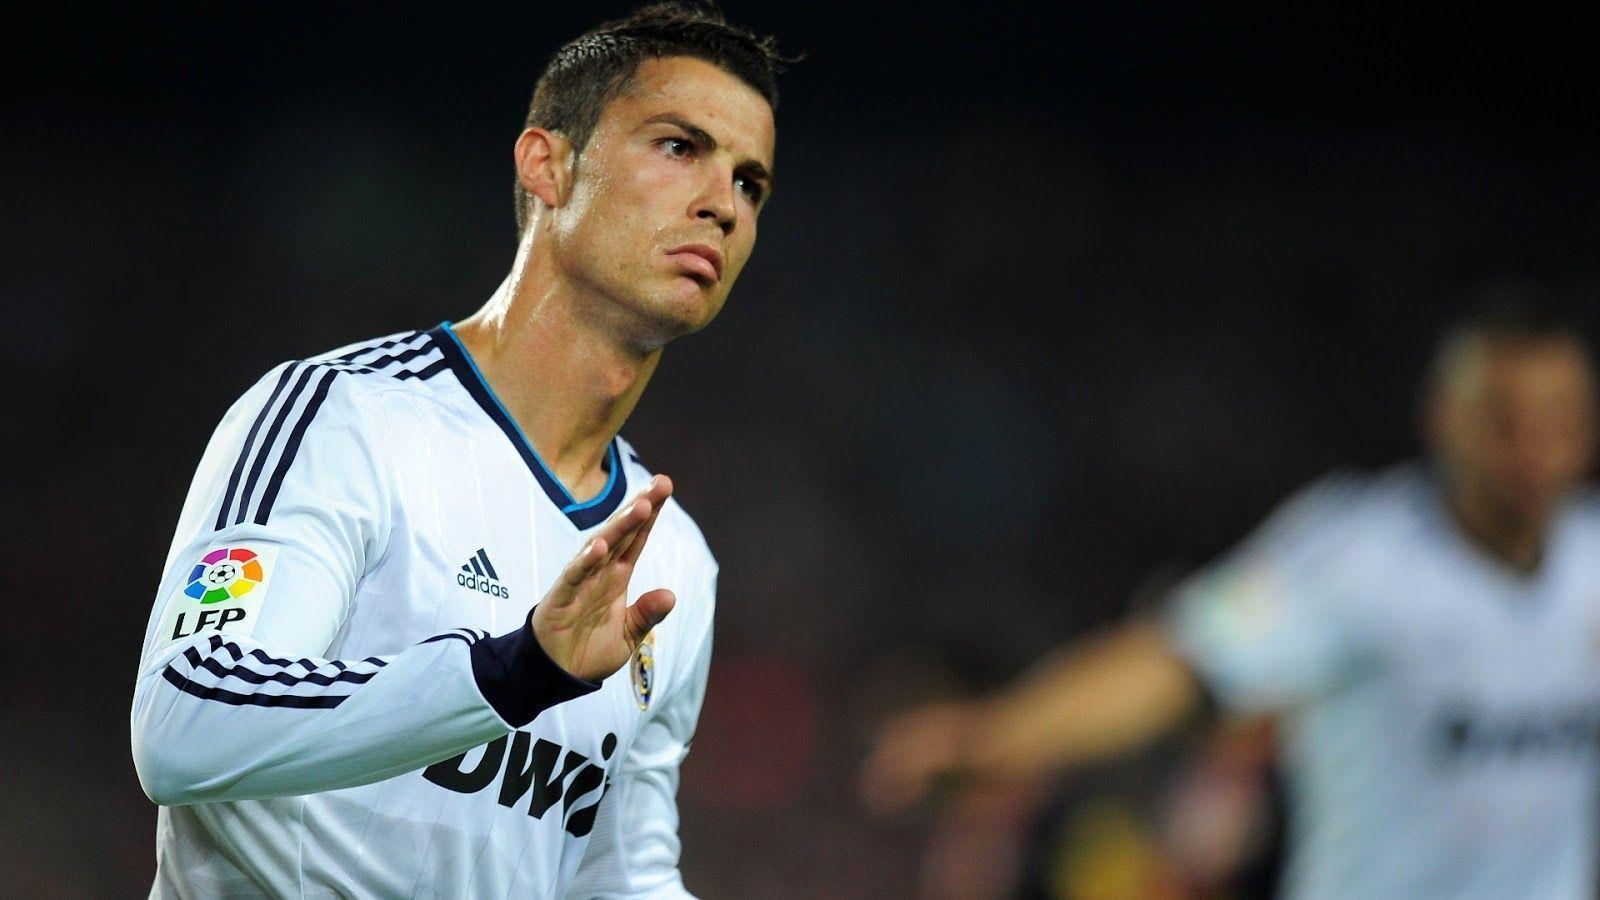 Cristiano Ronaldo Wallpaper Collection Pack 1